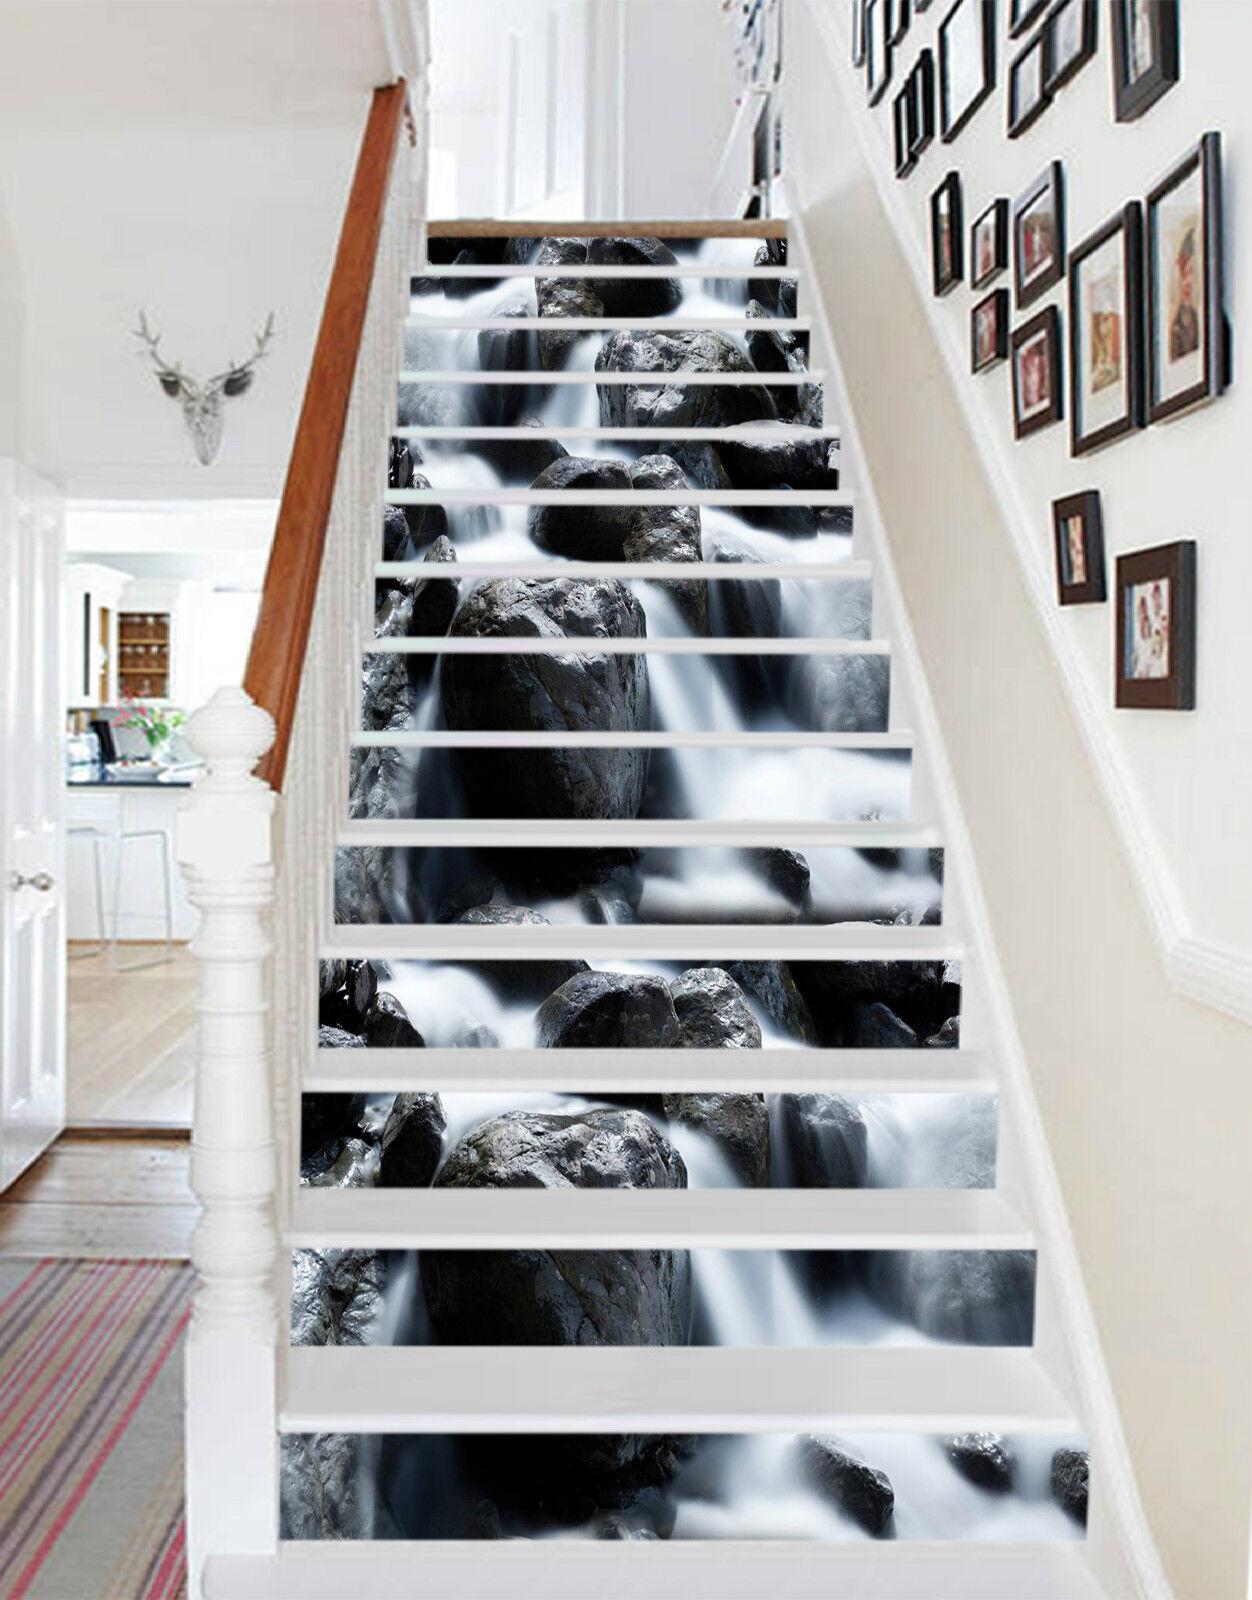 3D Baches Steine 24 Stair Risers Dekoration Fototapete Vinyl Aufkleber Tapete DE